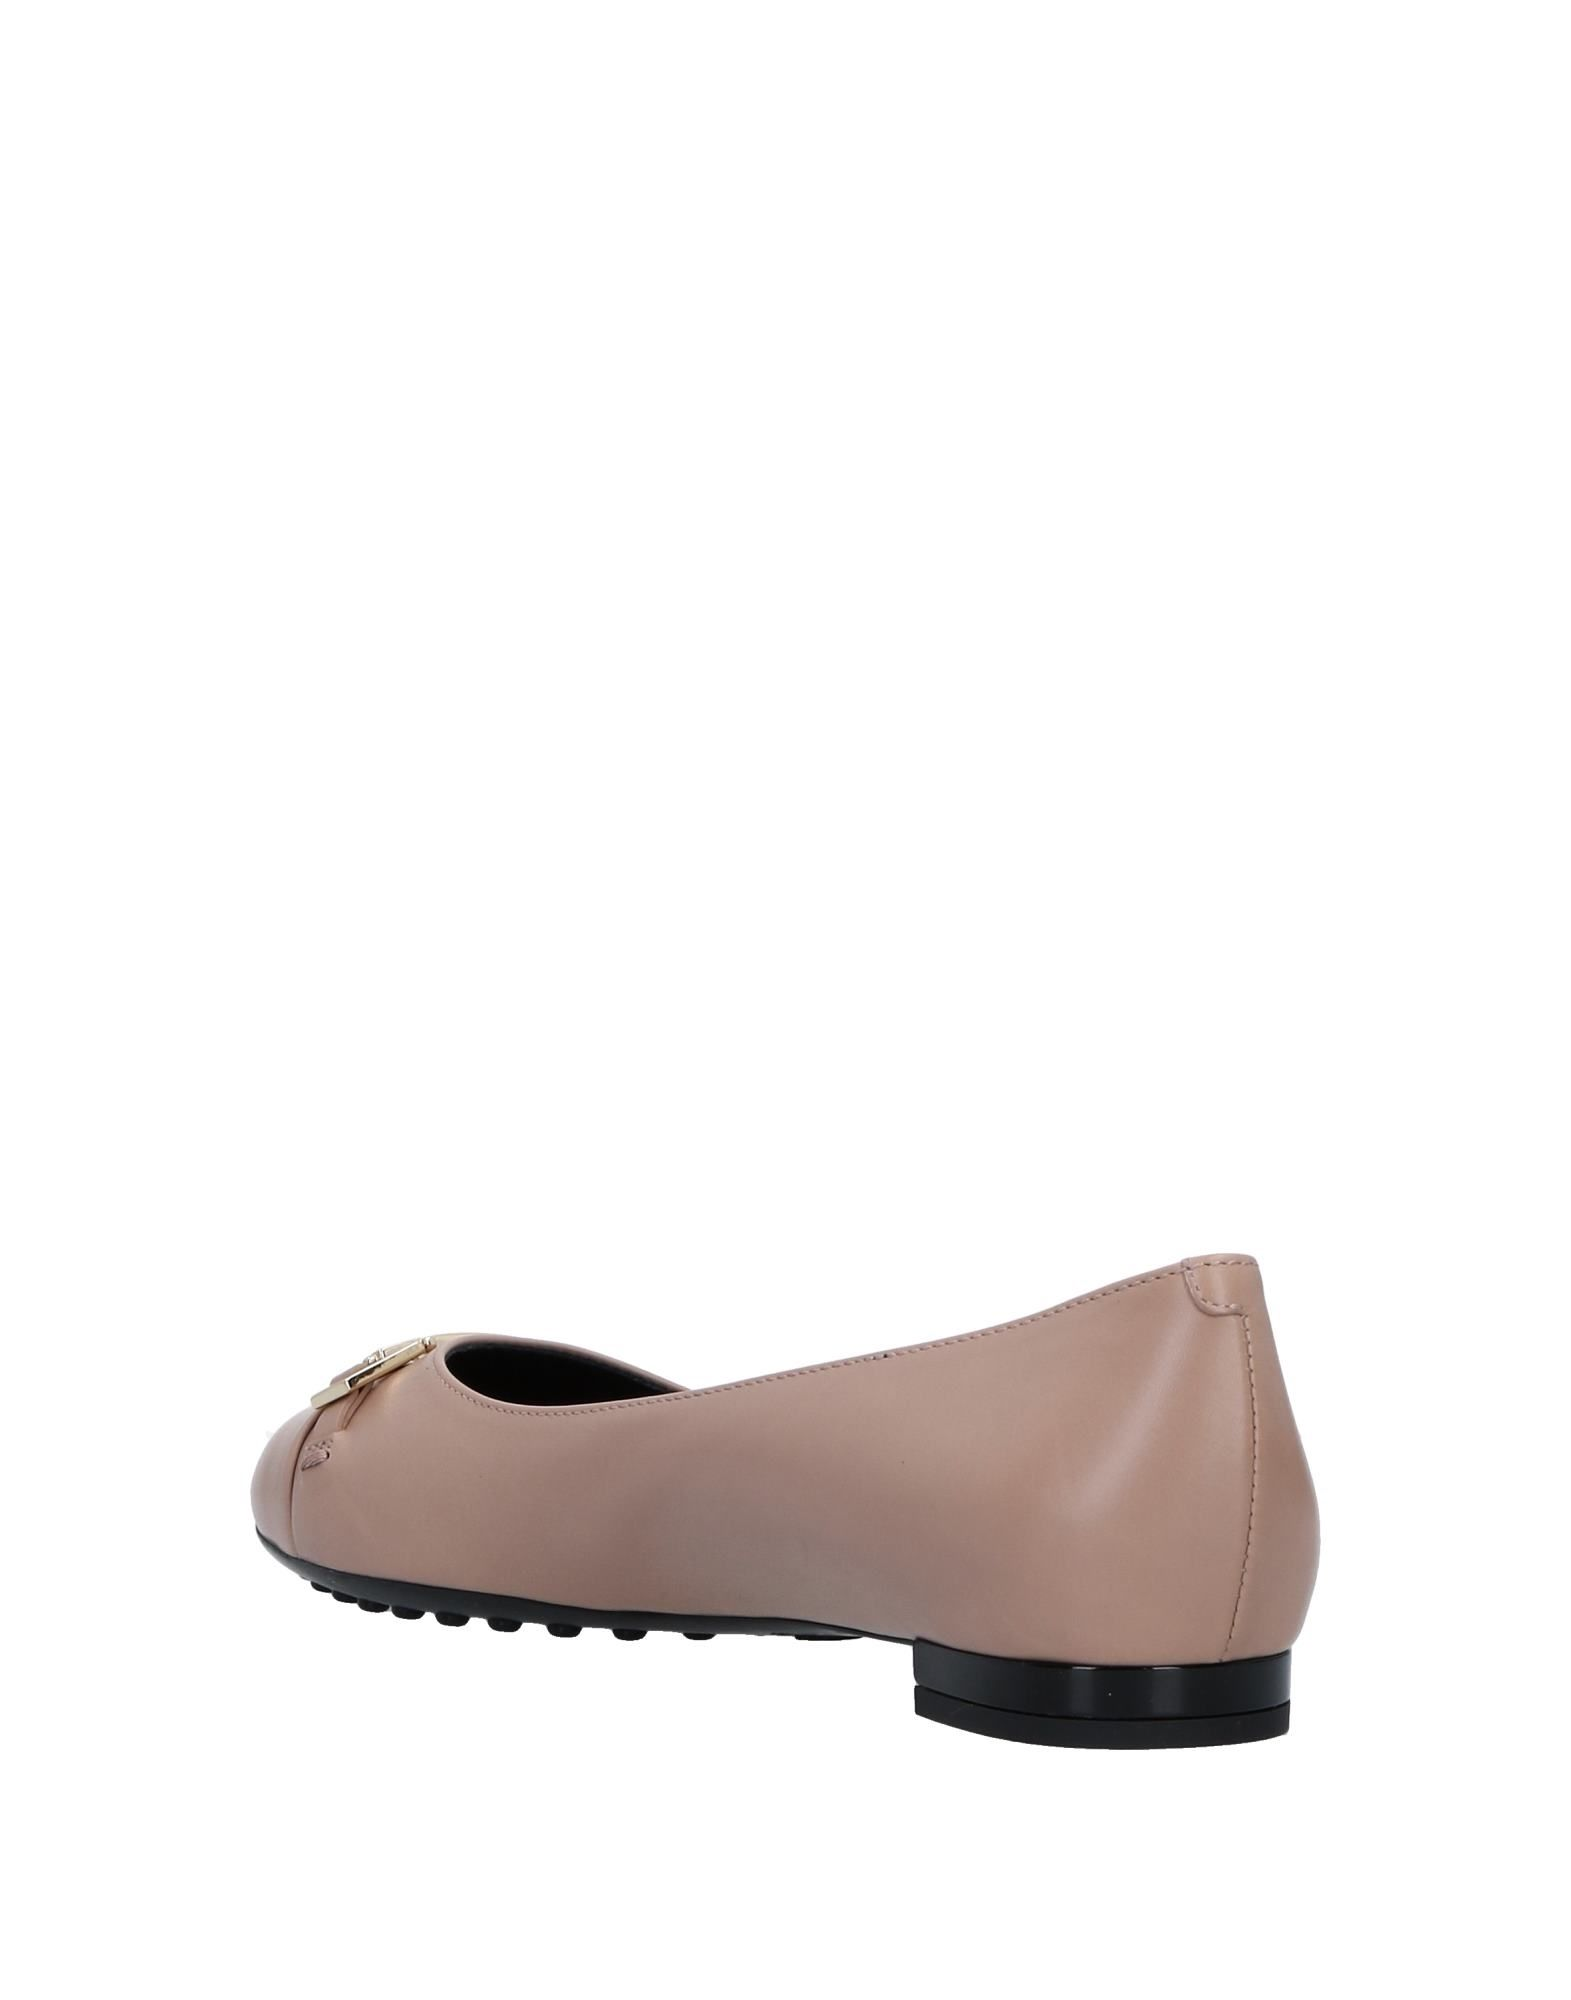 Tod's Tod's  Ballerinas Damen  11542326OA Heiße Schuhe 7c0f63